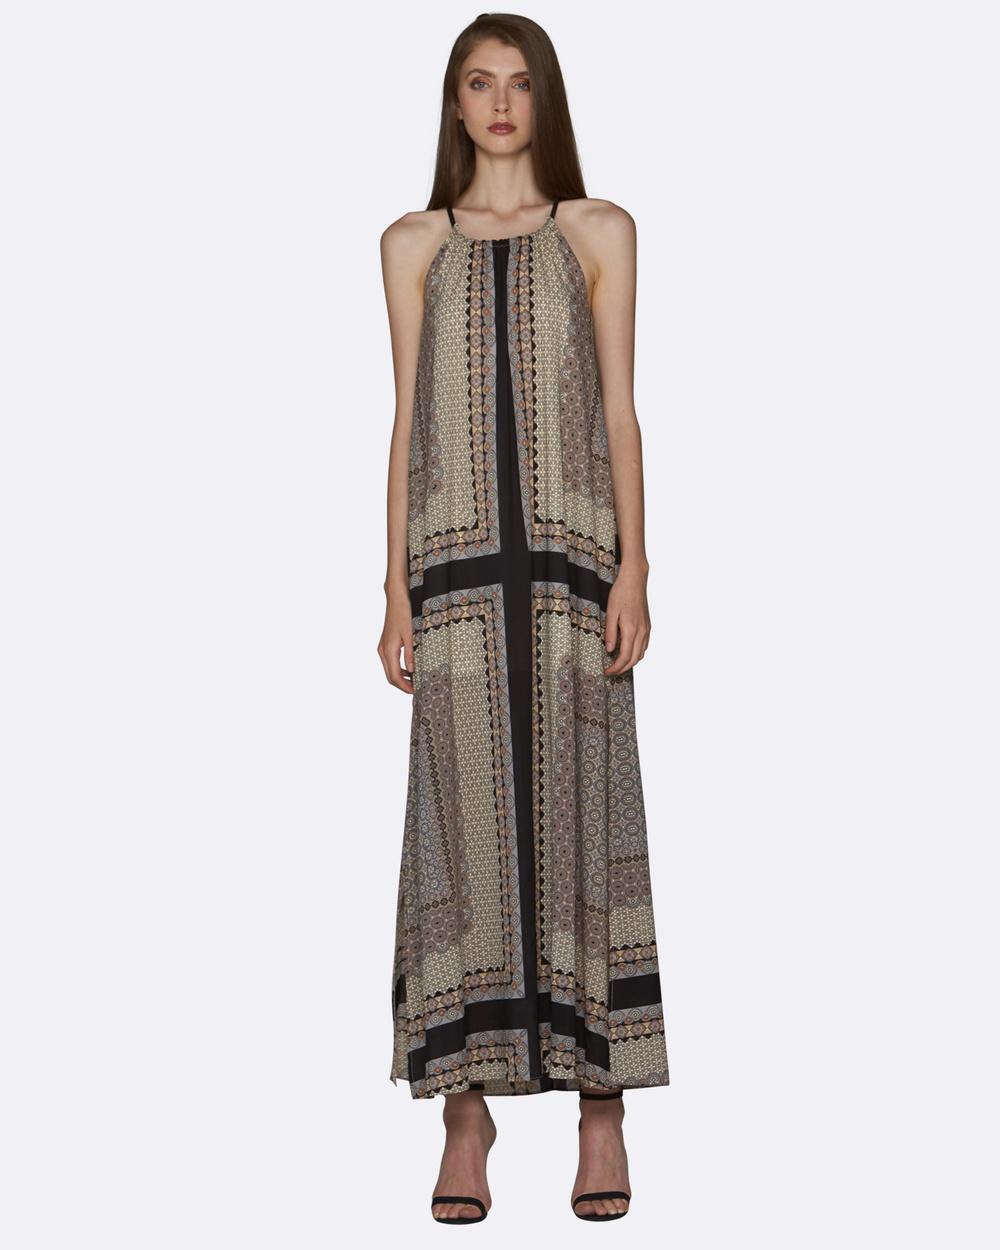 Amelius Baltic Maxi Dress Dresses Multi Baltic Maxi Dress